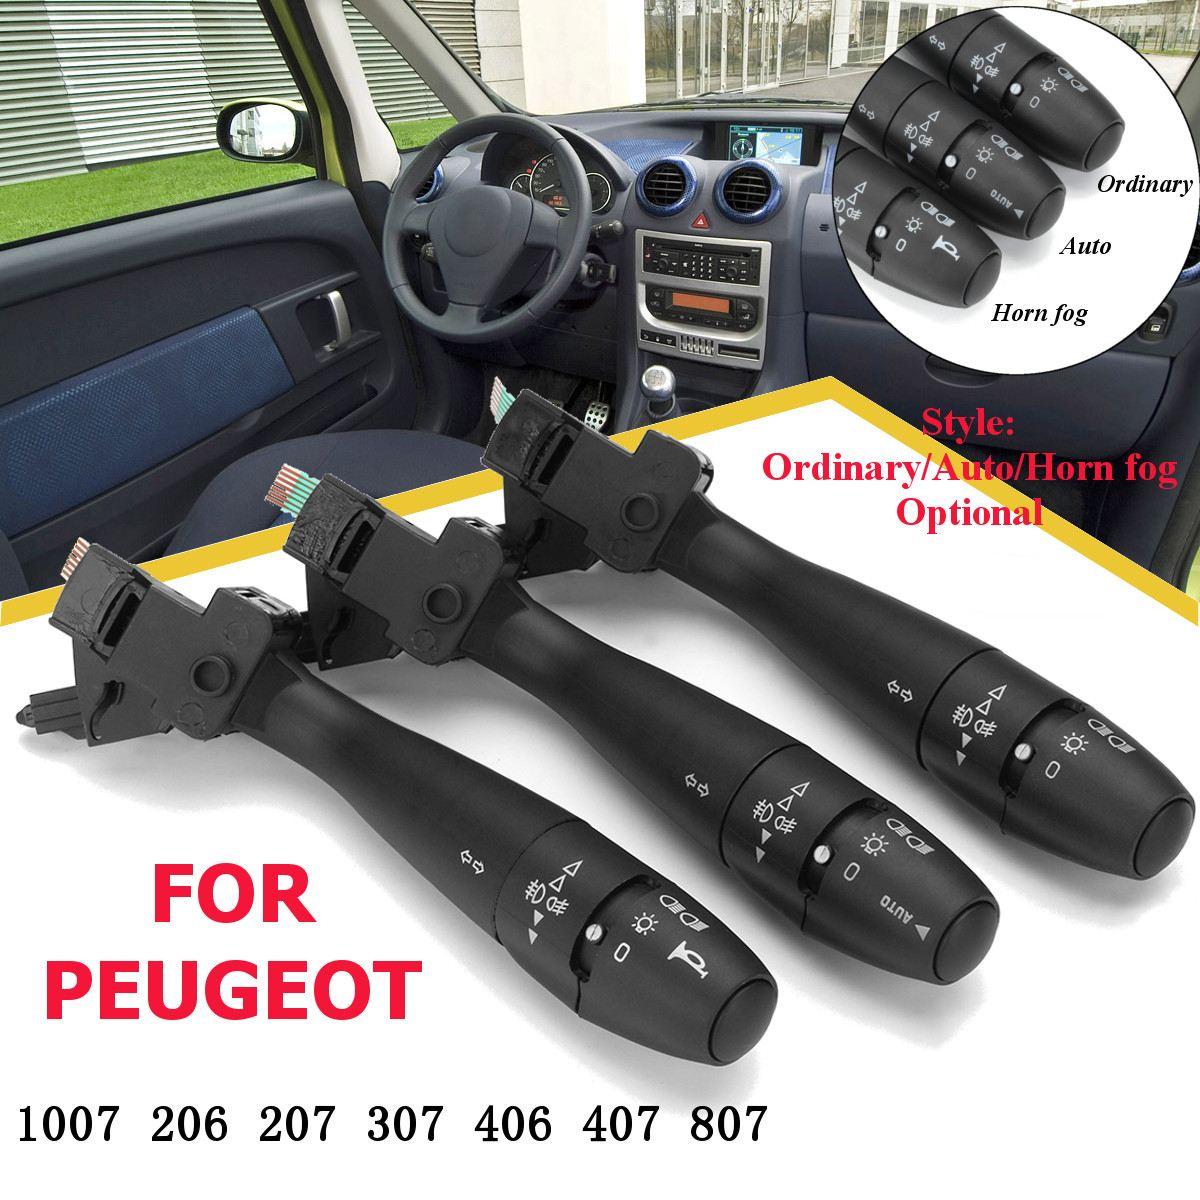 Interruptor indicador de sinal volta do carro coluna direção chifre auto 96477533xt para peugeot 1007 206 207 307 406 407 807